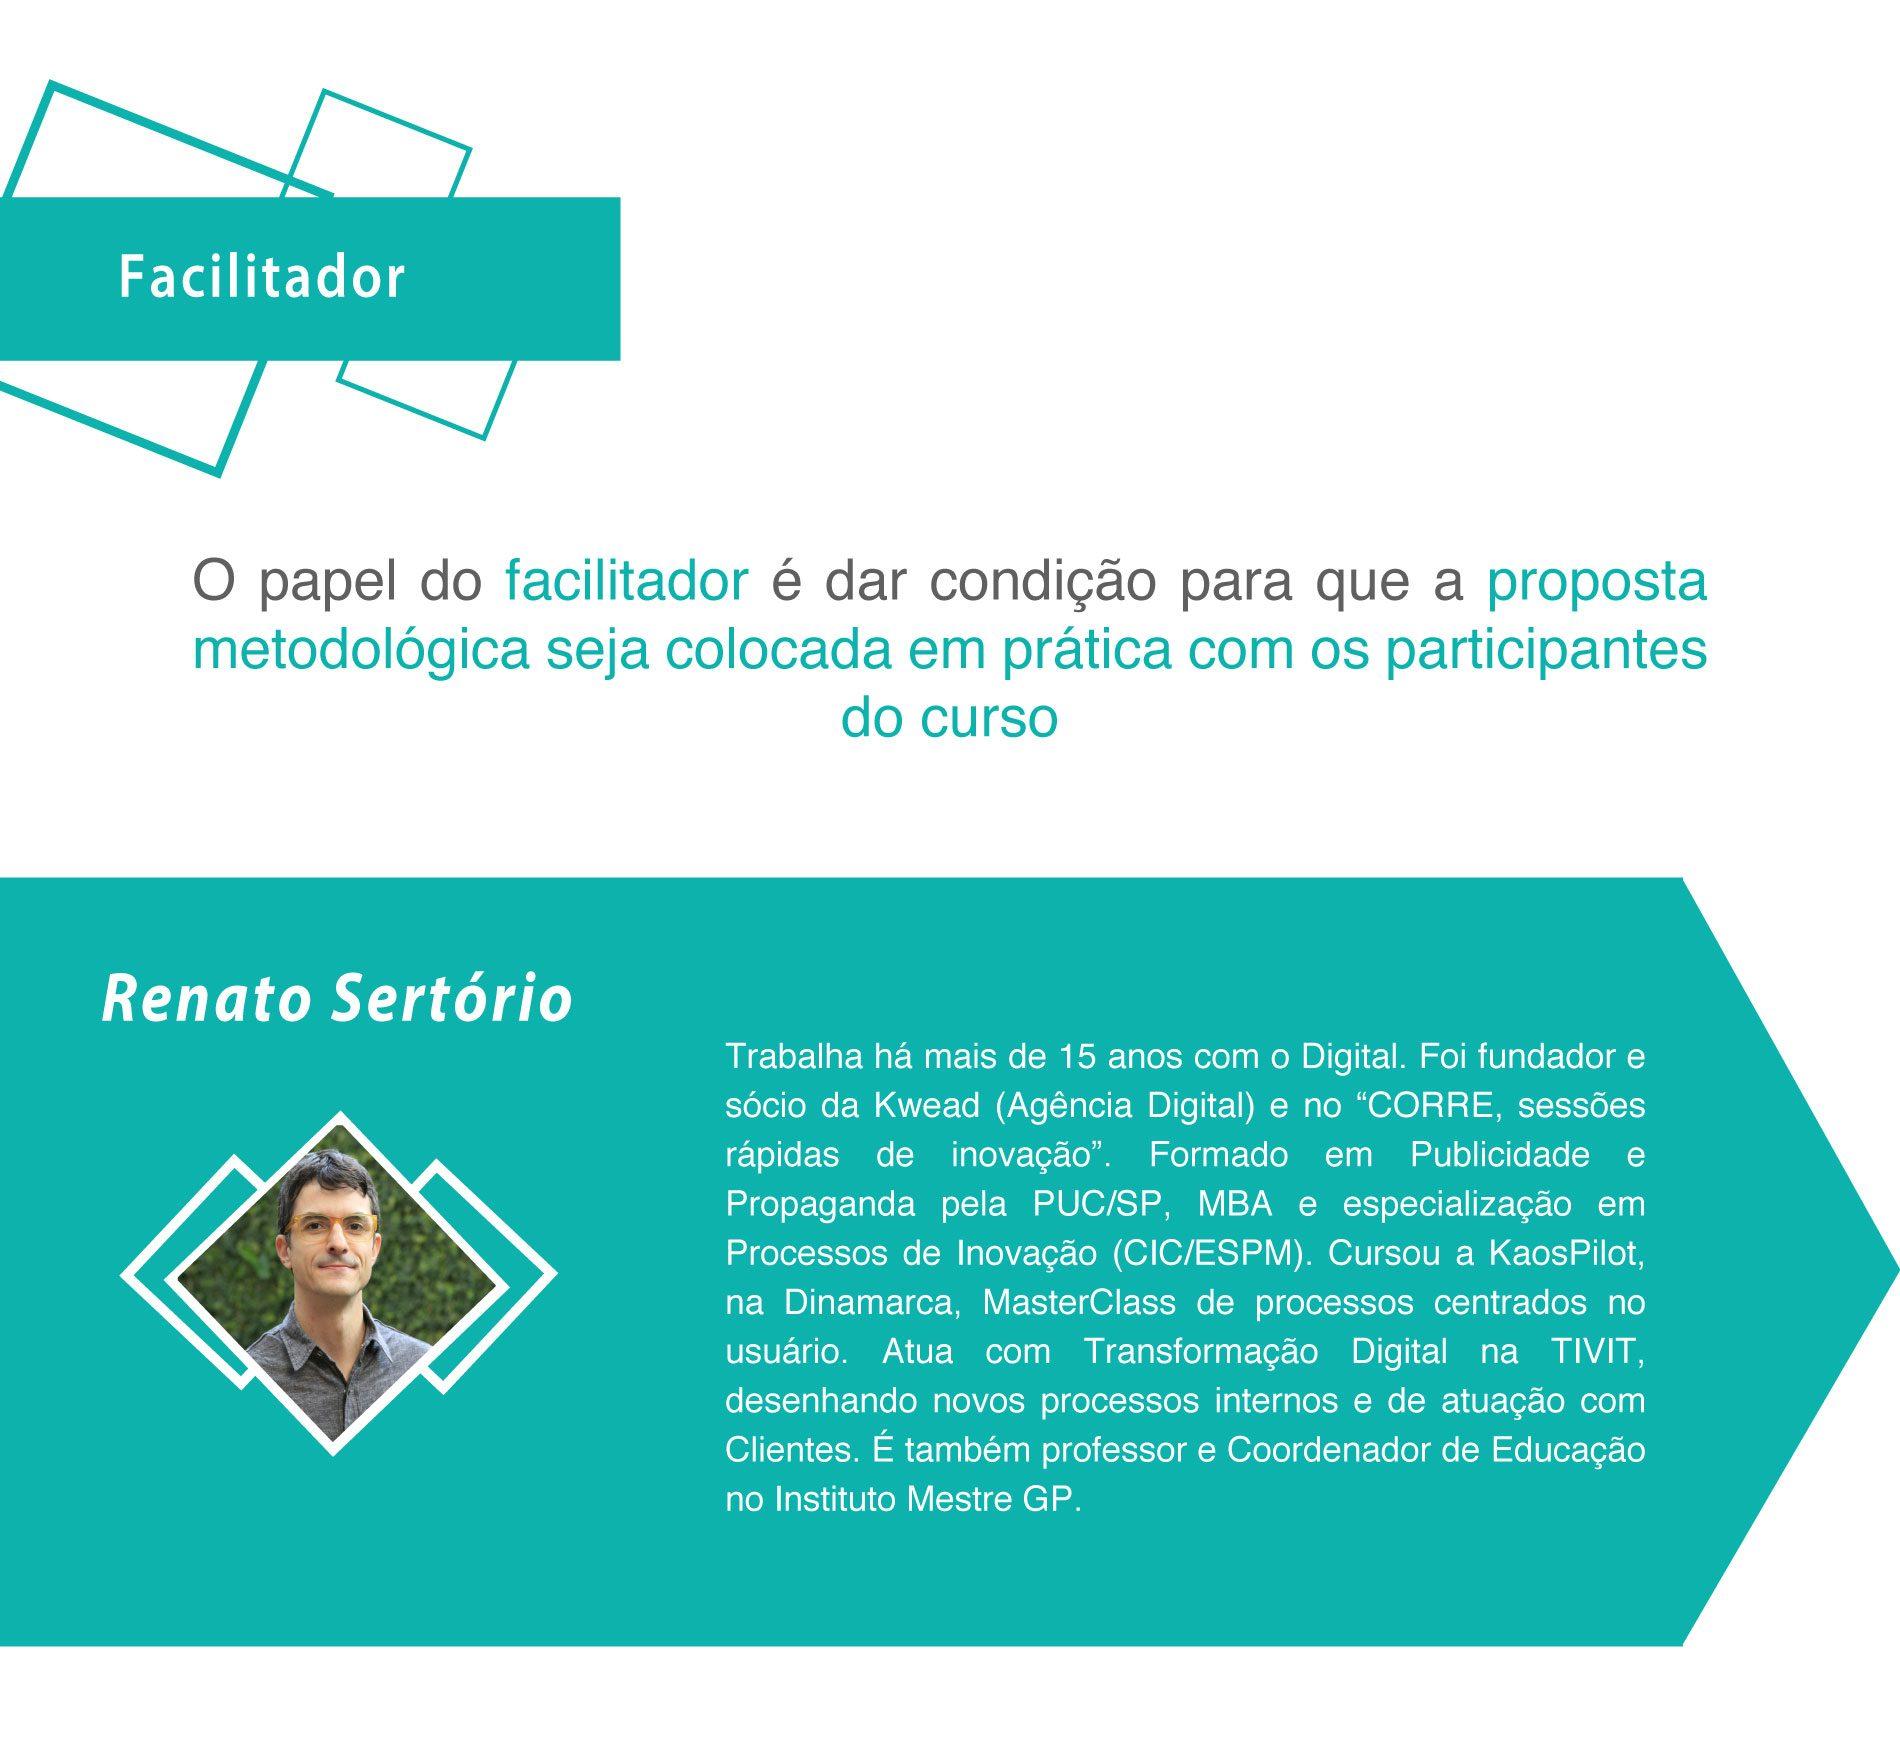 https://www.mestregp.com.br/wp-content/uploads/2018/02/Pagina-CdE-Design-Thinking-Facilitador-1-1900x1761.jpg